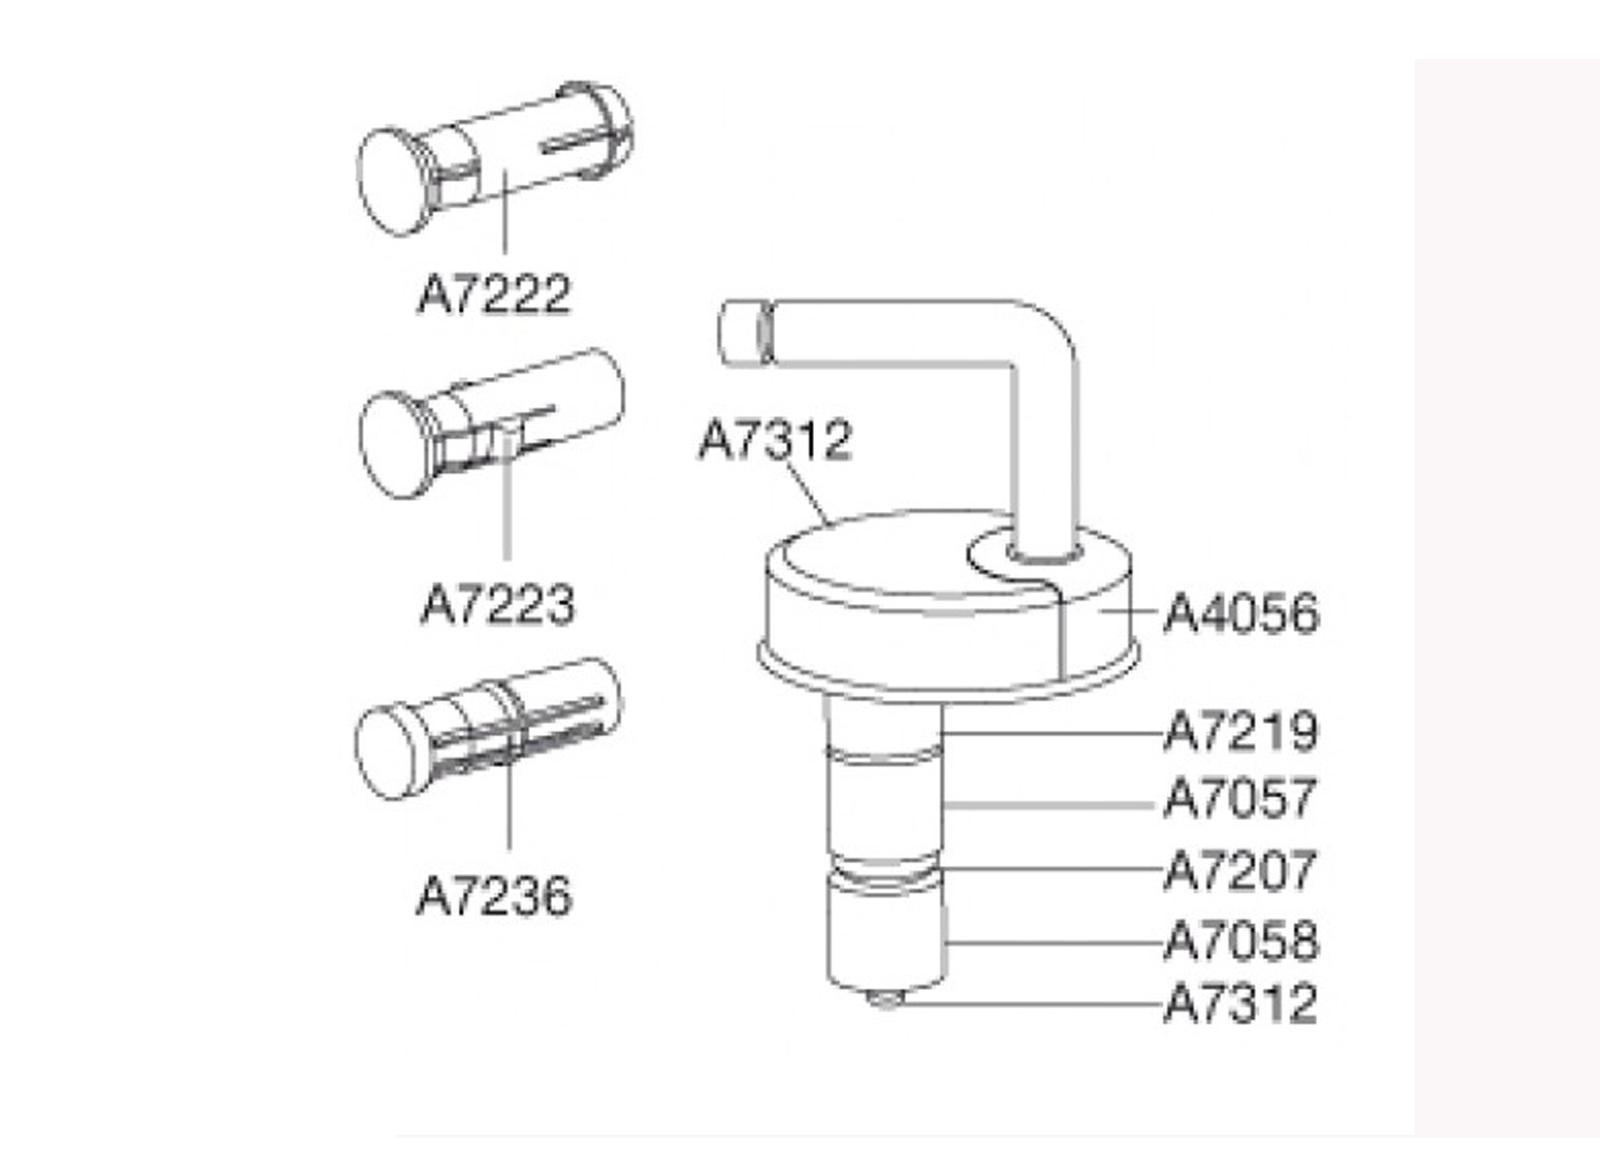 pressalit scharniersatz wc sitz d43 b16 formular colani. Black Bedroom Furniture Sets. Home Design Ideas